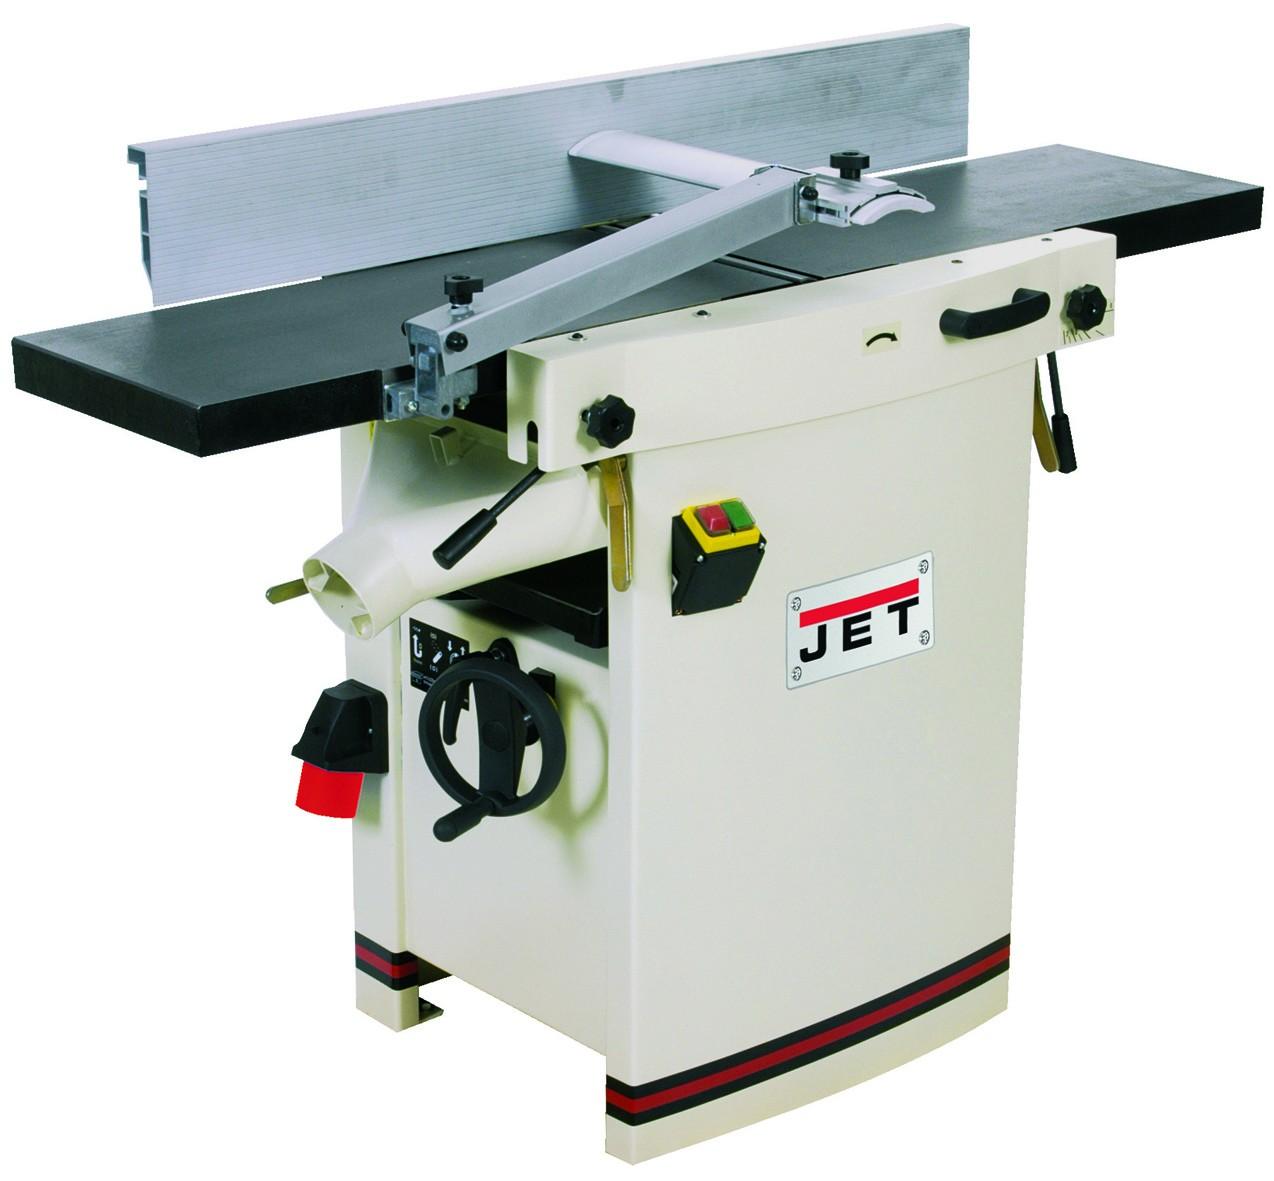 JET JPT-310